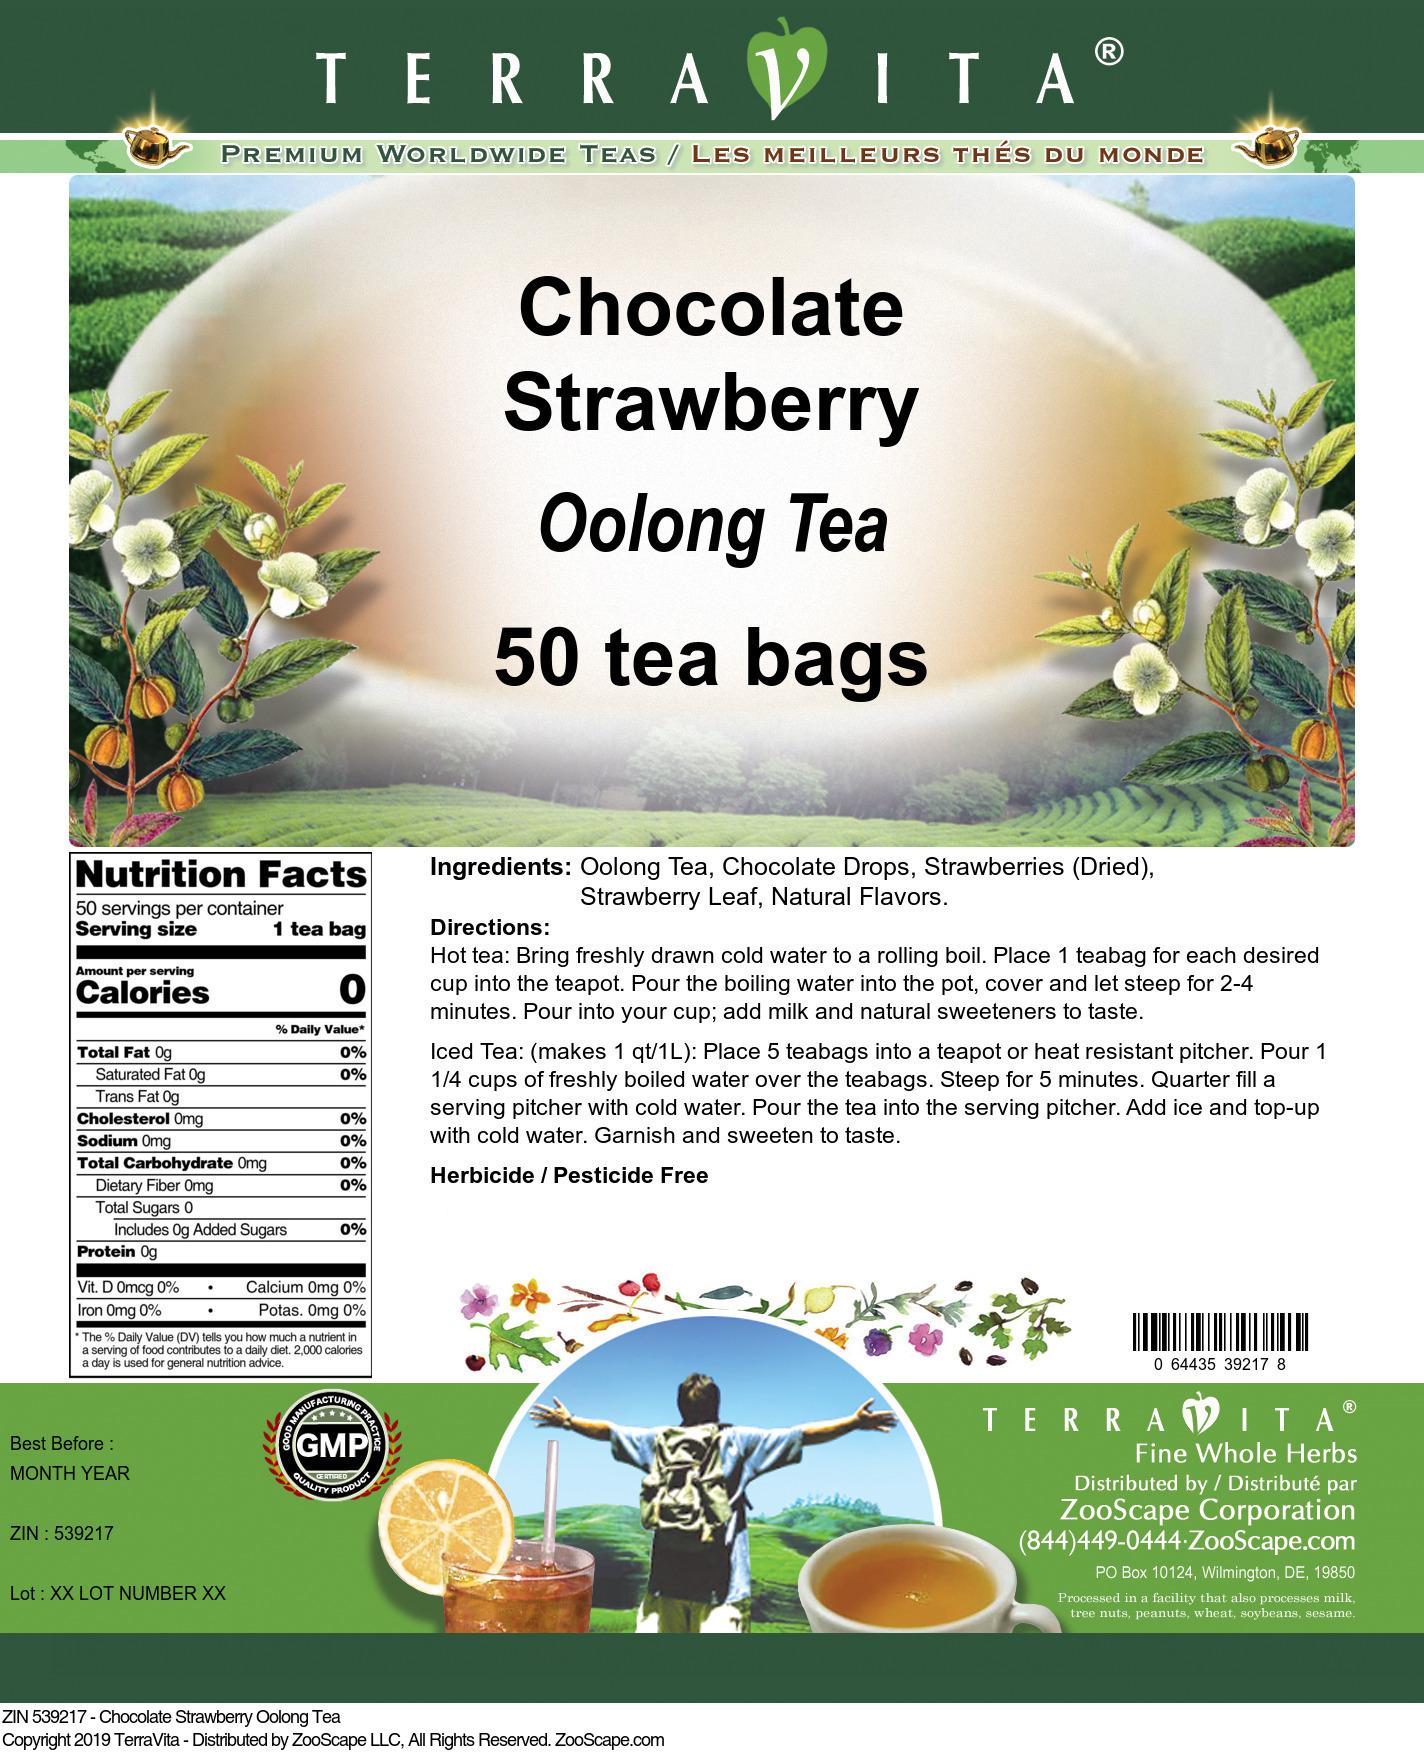 Chocolate Strawberry Oolong Tea